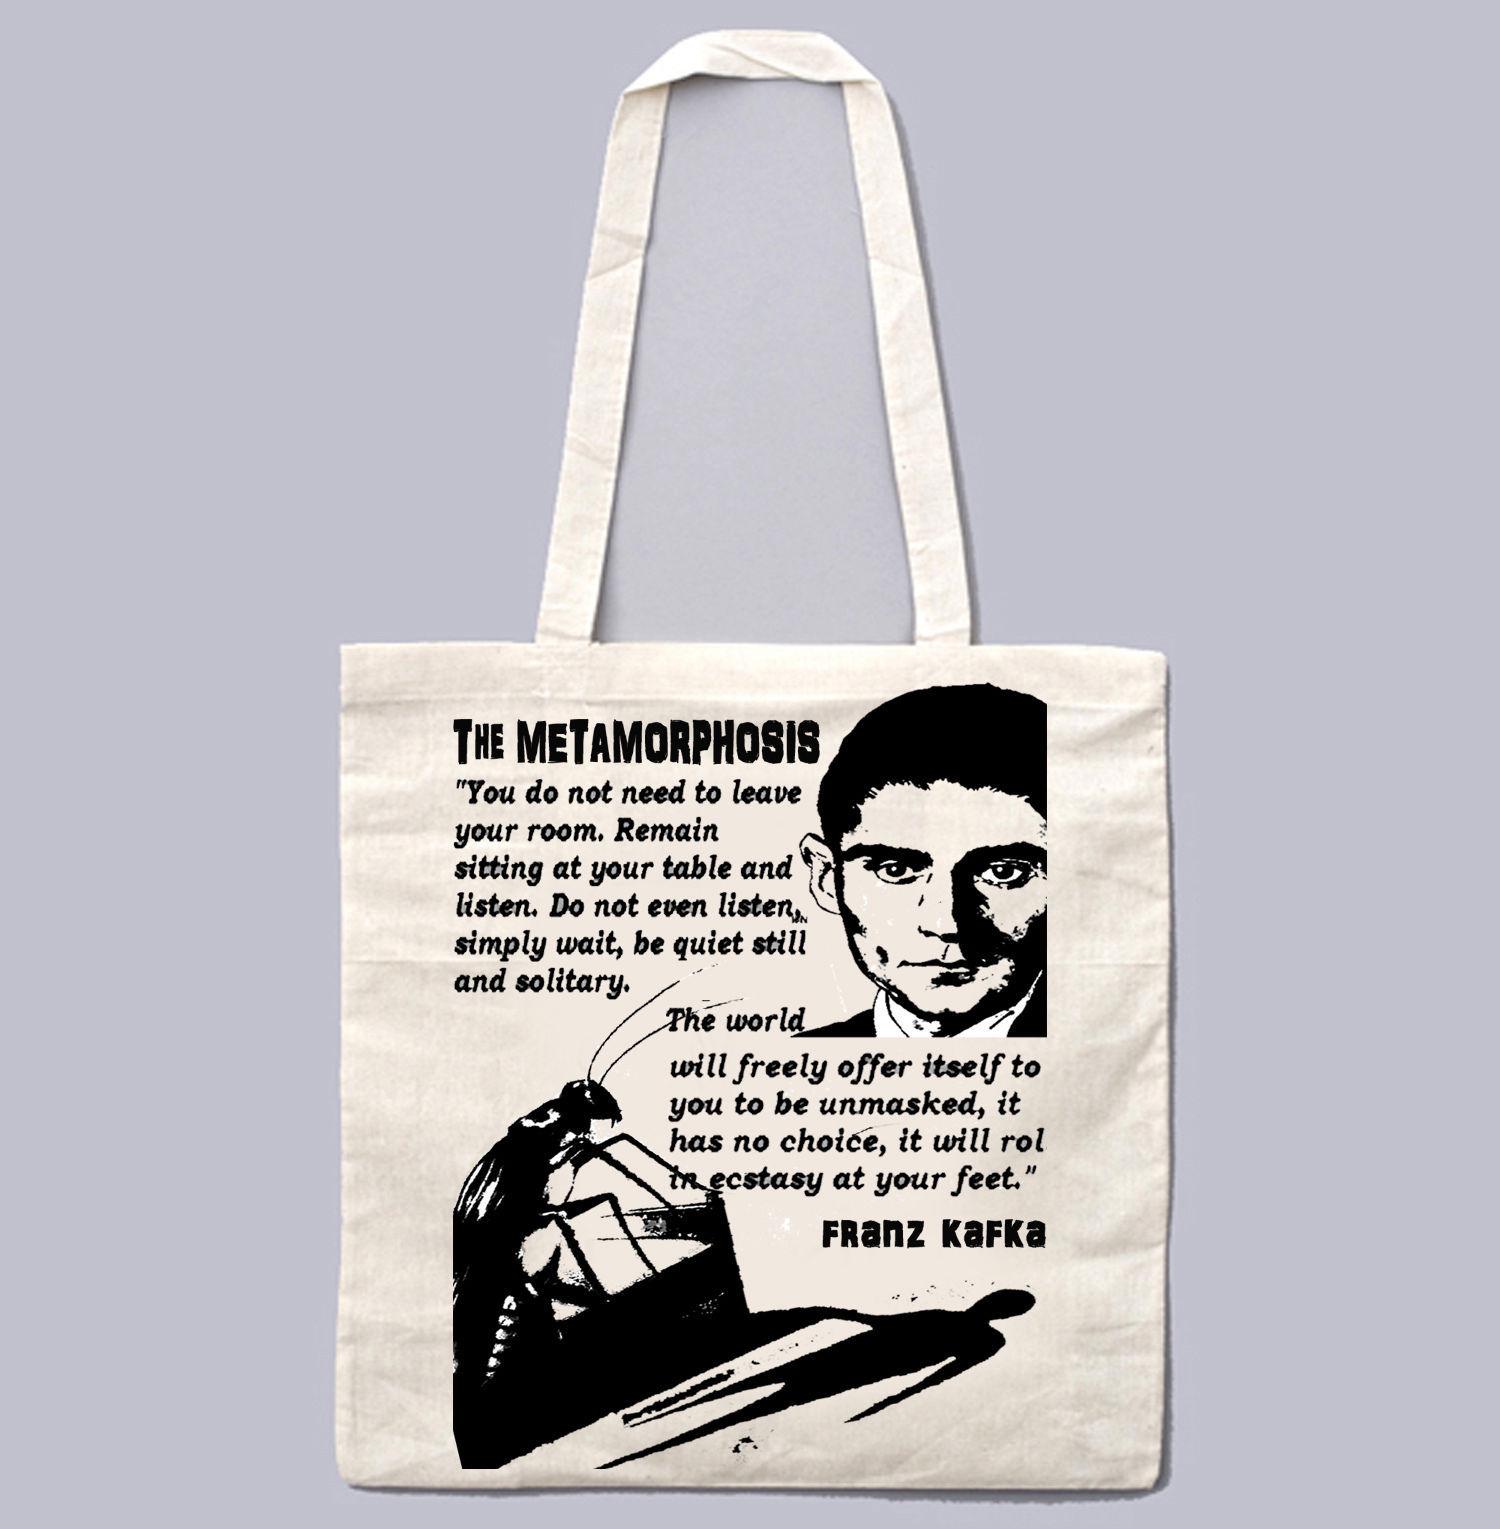 FRANZ KAFKA THE METHAMORPHOSIS 1 - NEW AMAZING GRAPHIC WHITE HAND BAG/TOTE BAG